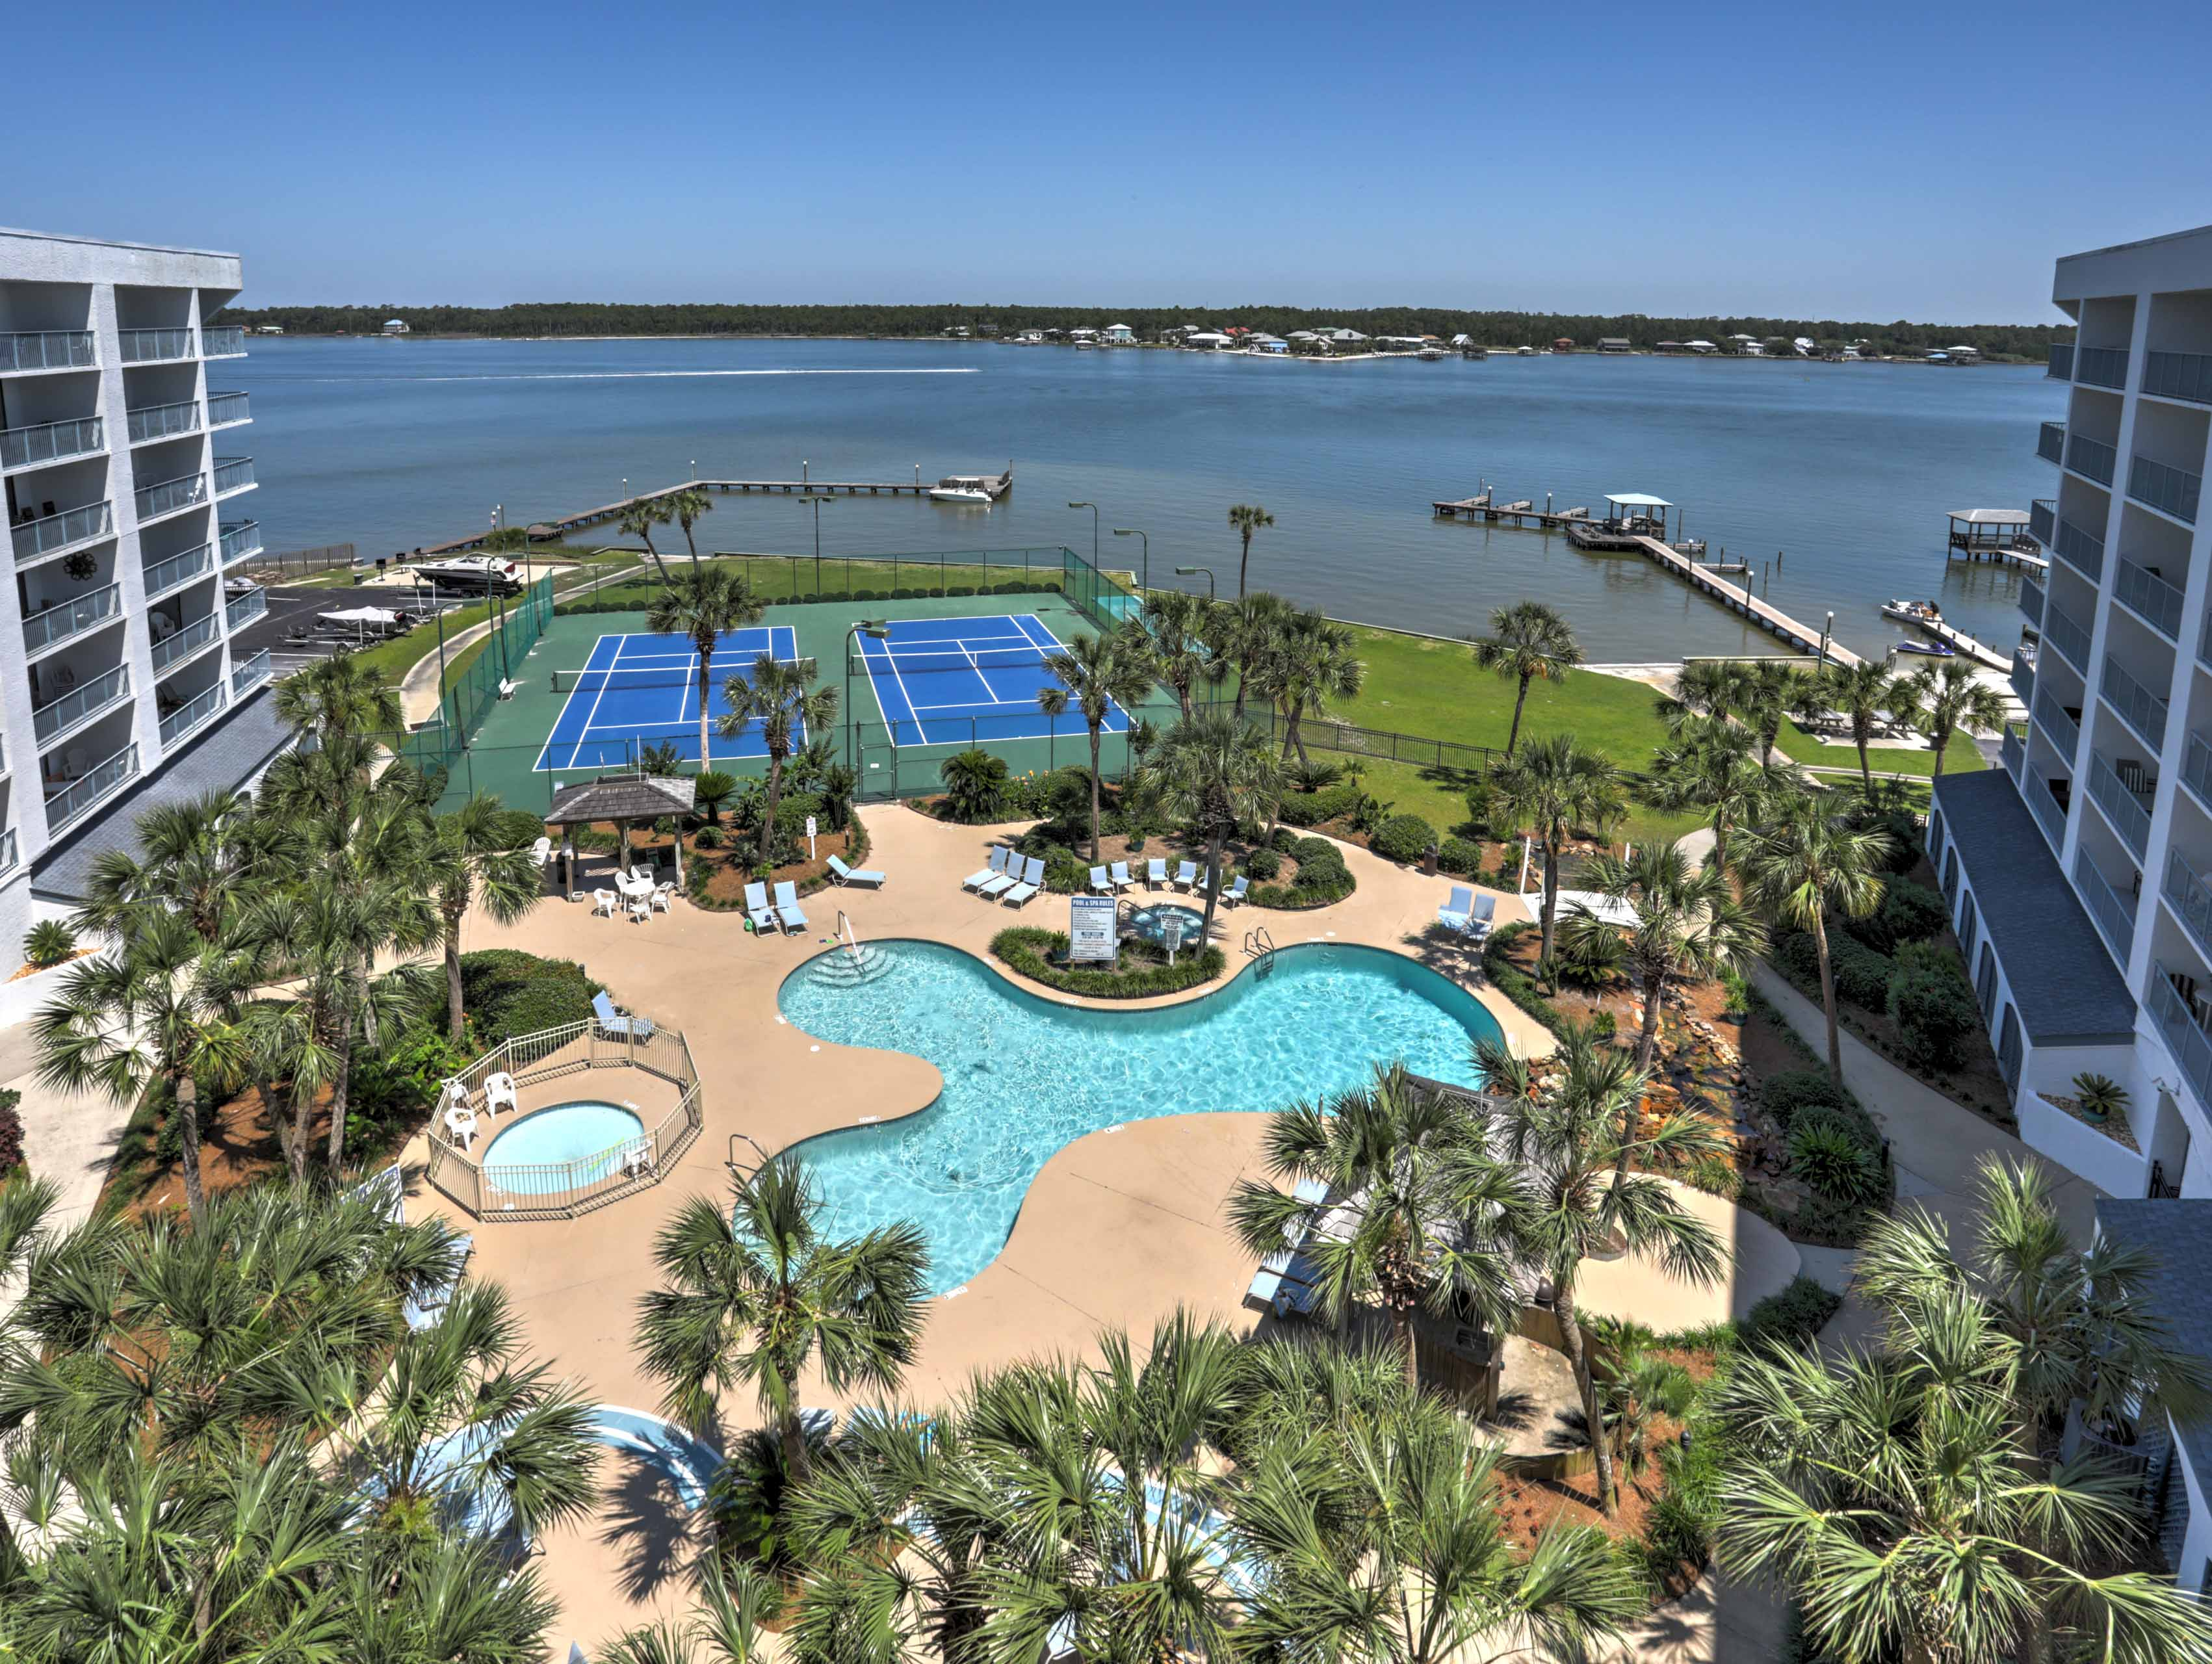 Gulf Shores Vacation Rental | 2BR | 1BA | Single Story | 650 Sq Ft